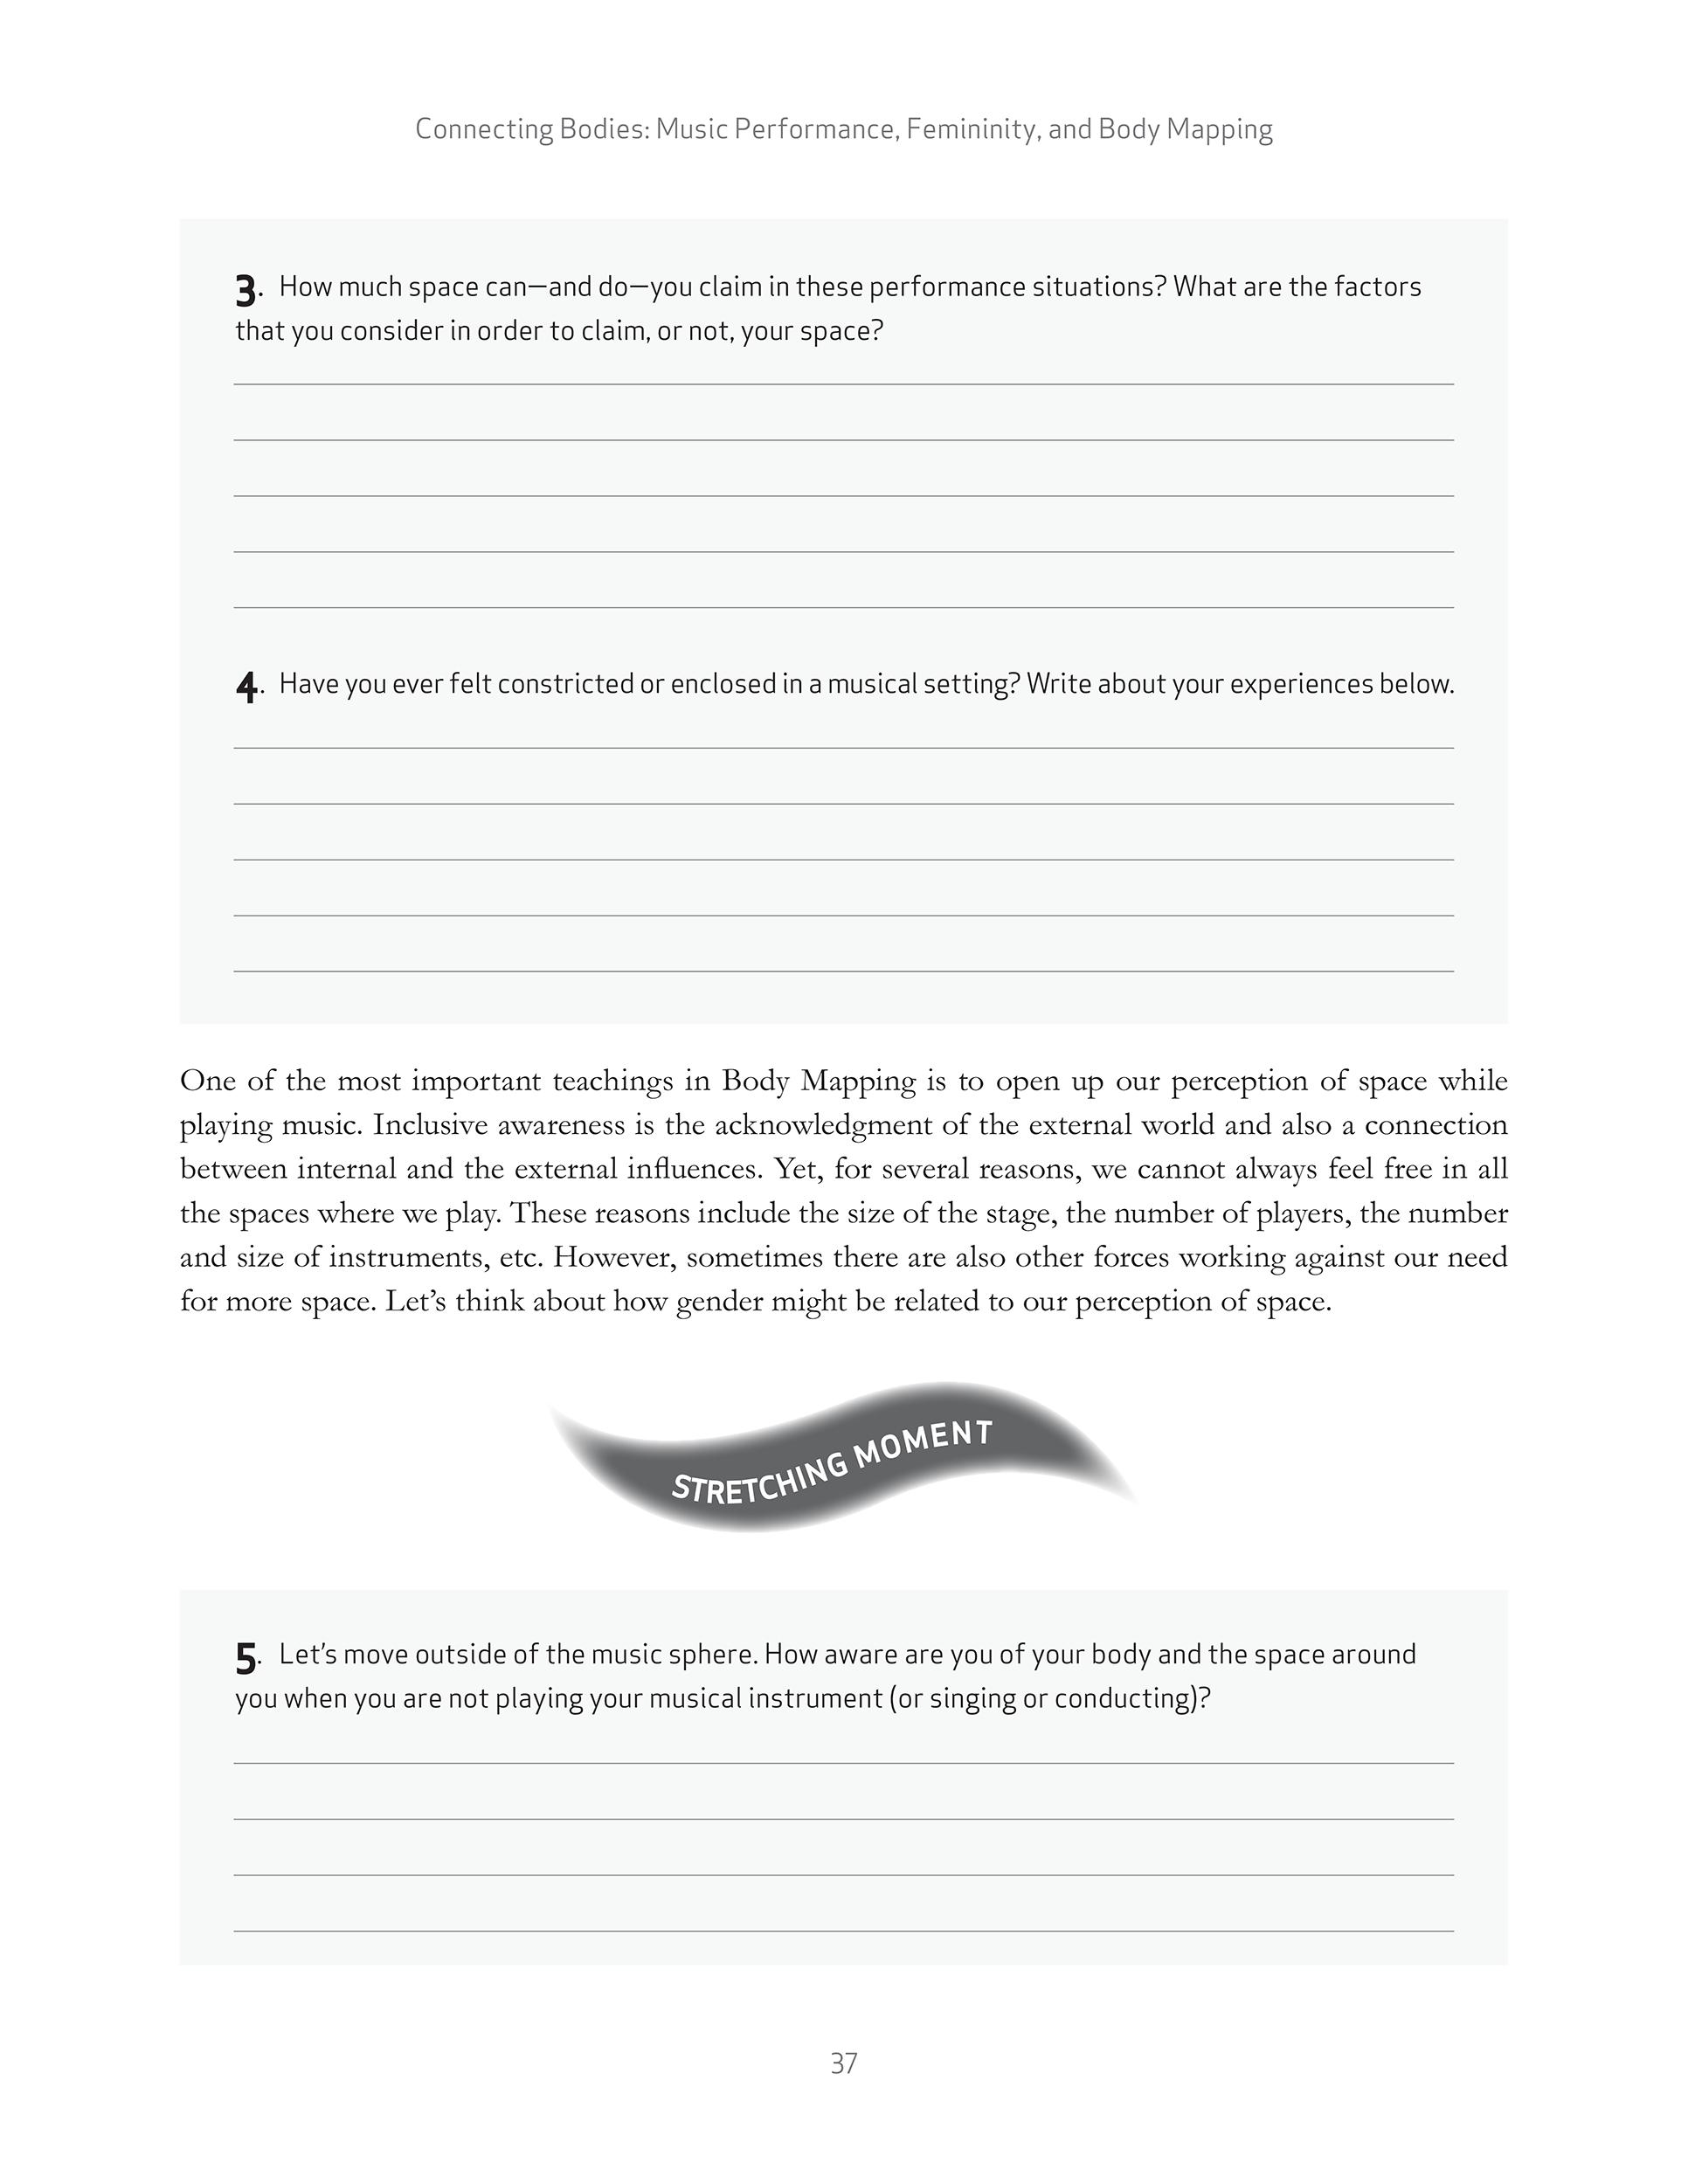 Workbook Chapter 3 Sample